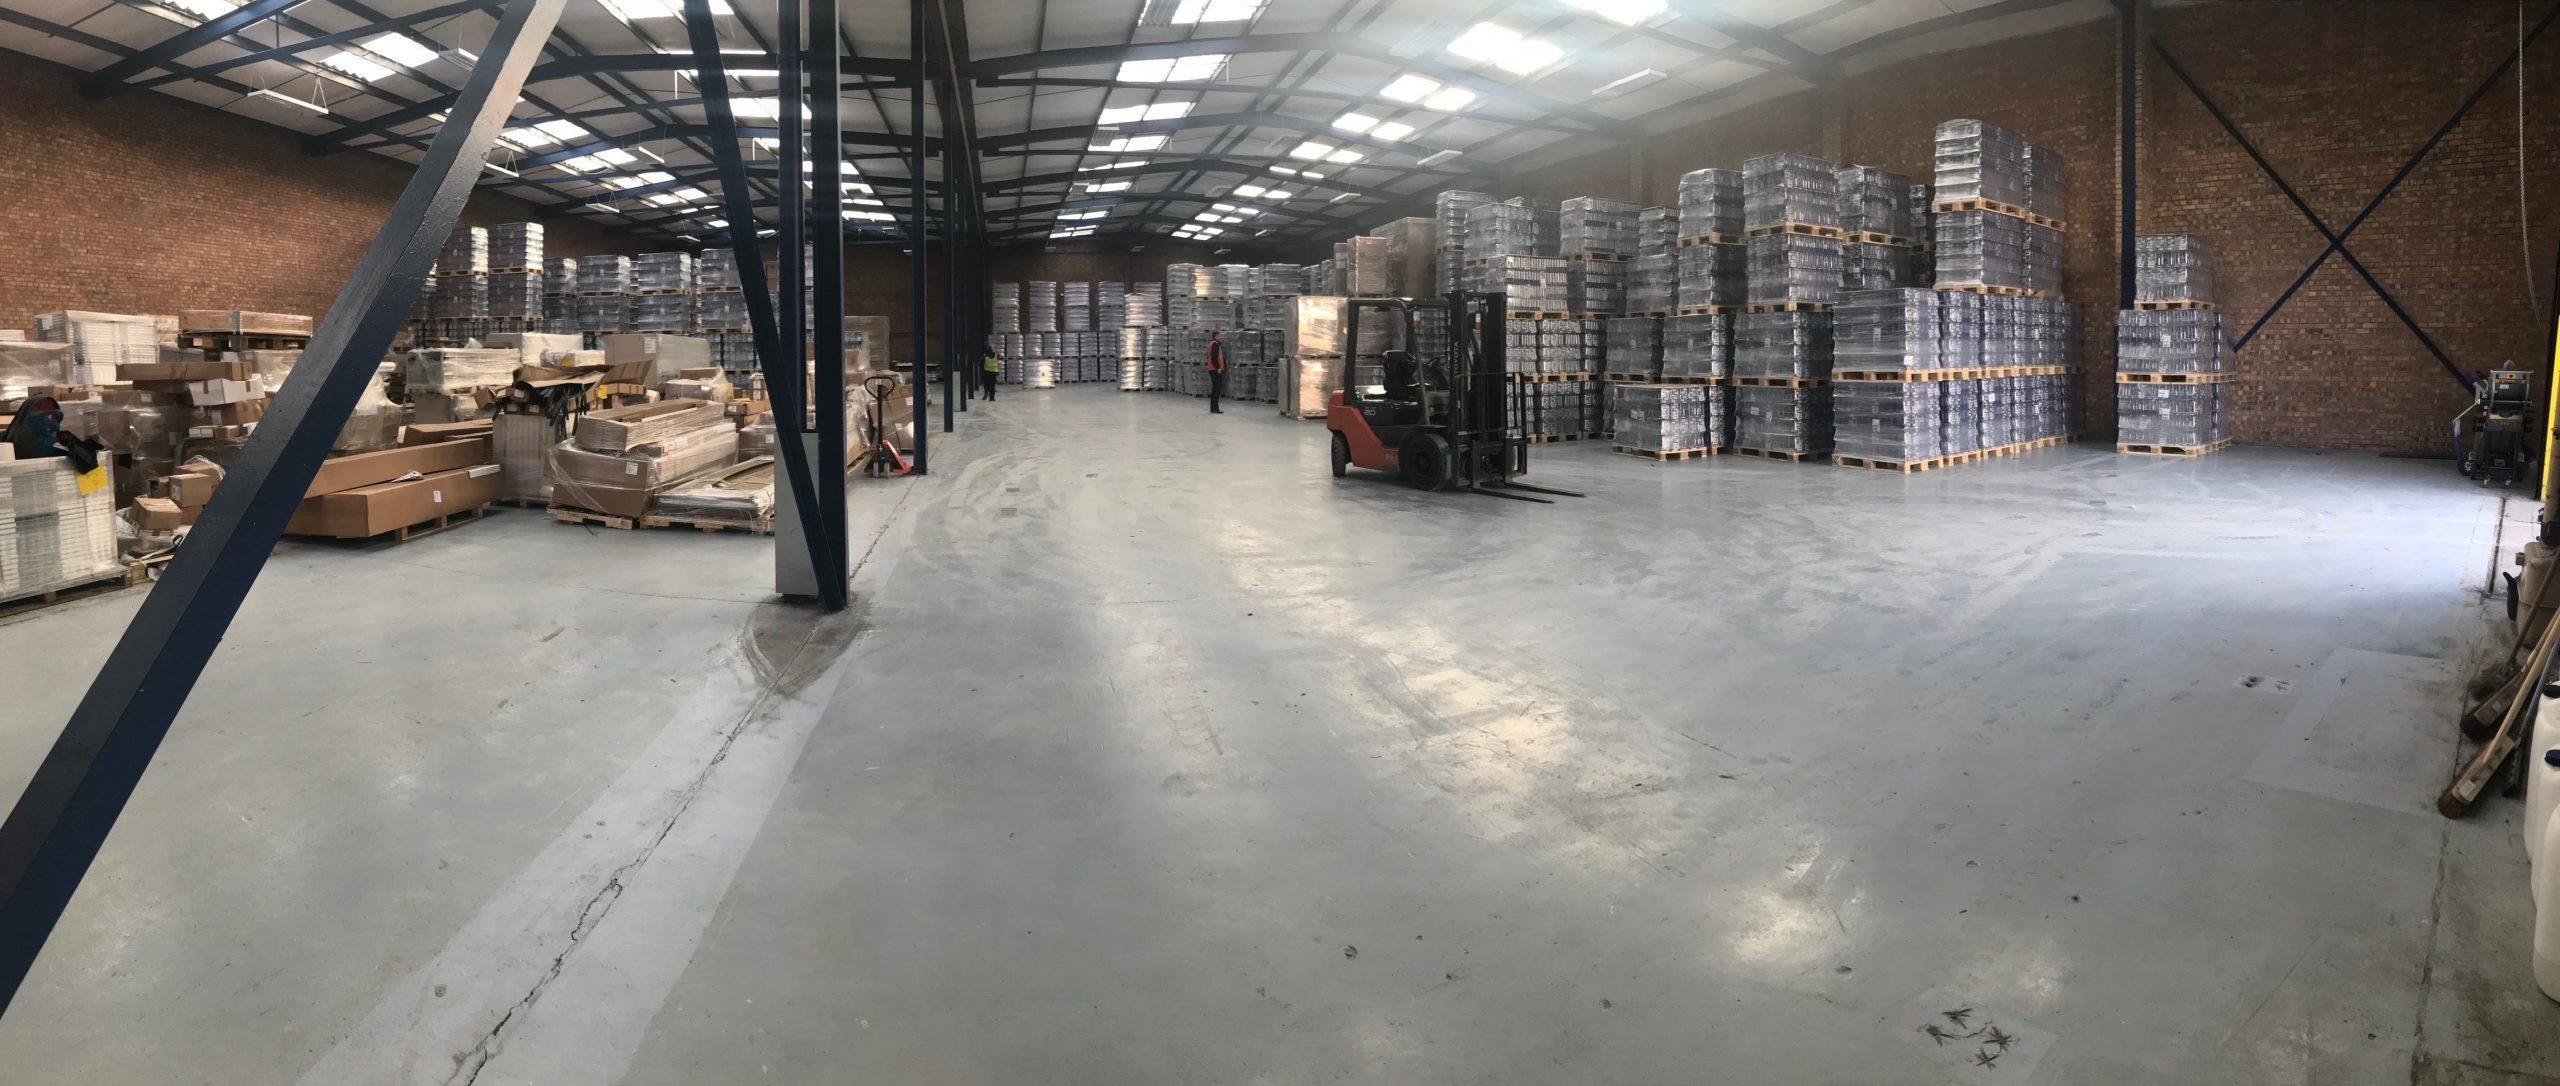 Perry-Bar-Warehouse-min-scaled.jpg